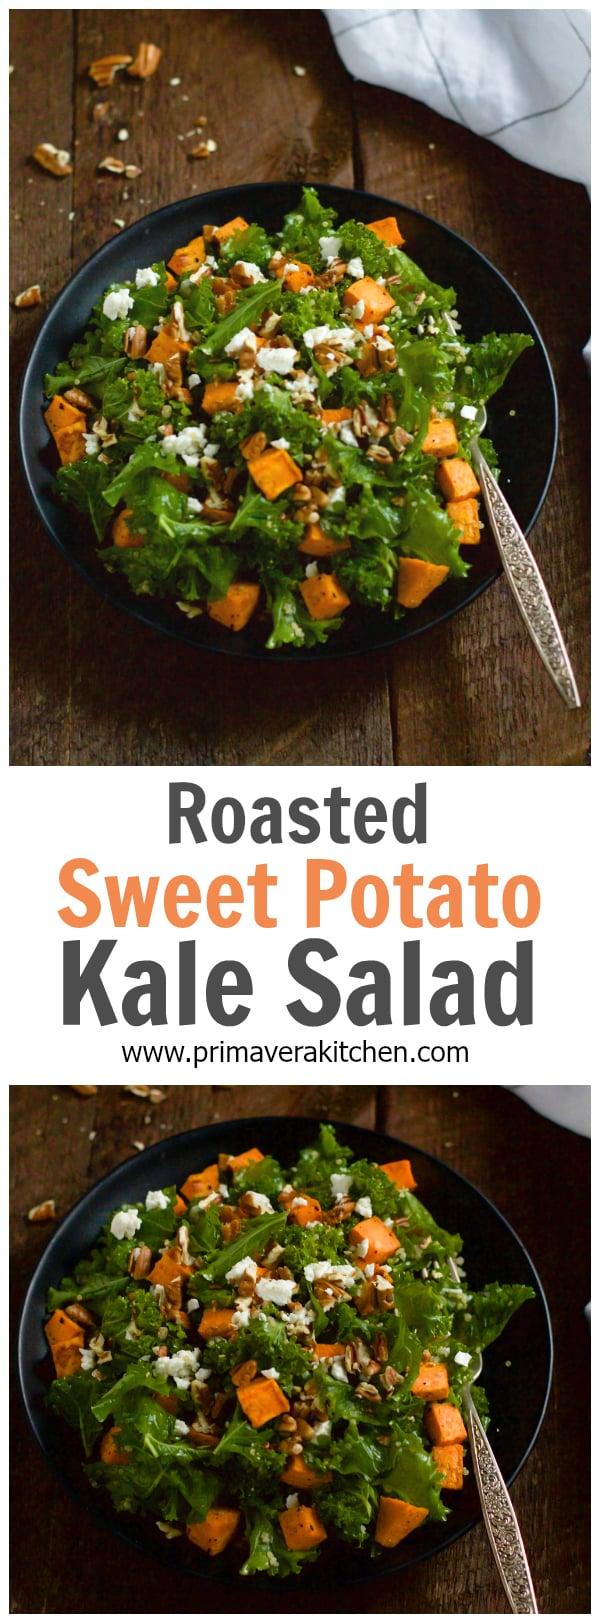 Roasted Sweet Potato Kale Salad - This hearty Roasted Sweet Potato Kale Salad is made with massaged kale, roasted sweet potatoes, pecans and crumbled Feta cheese.